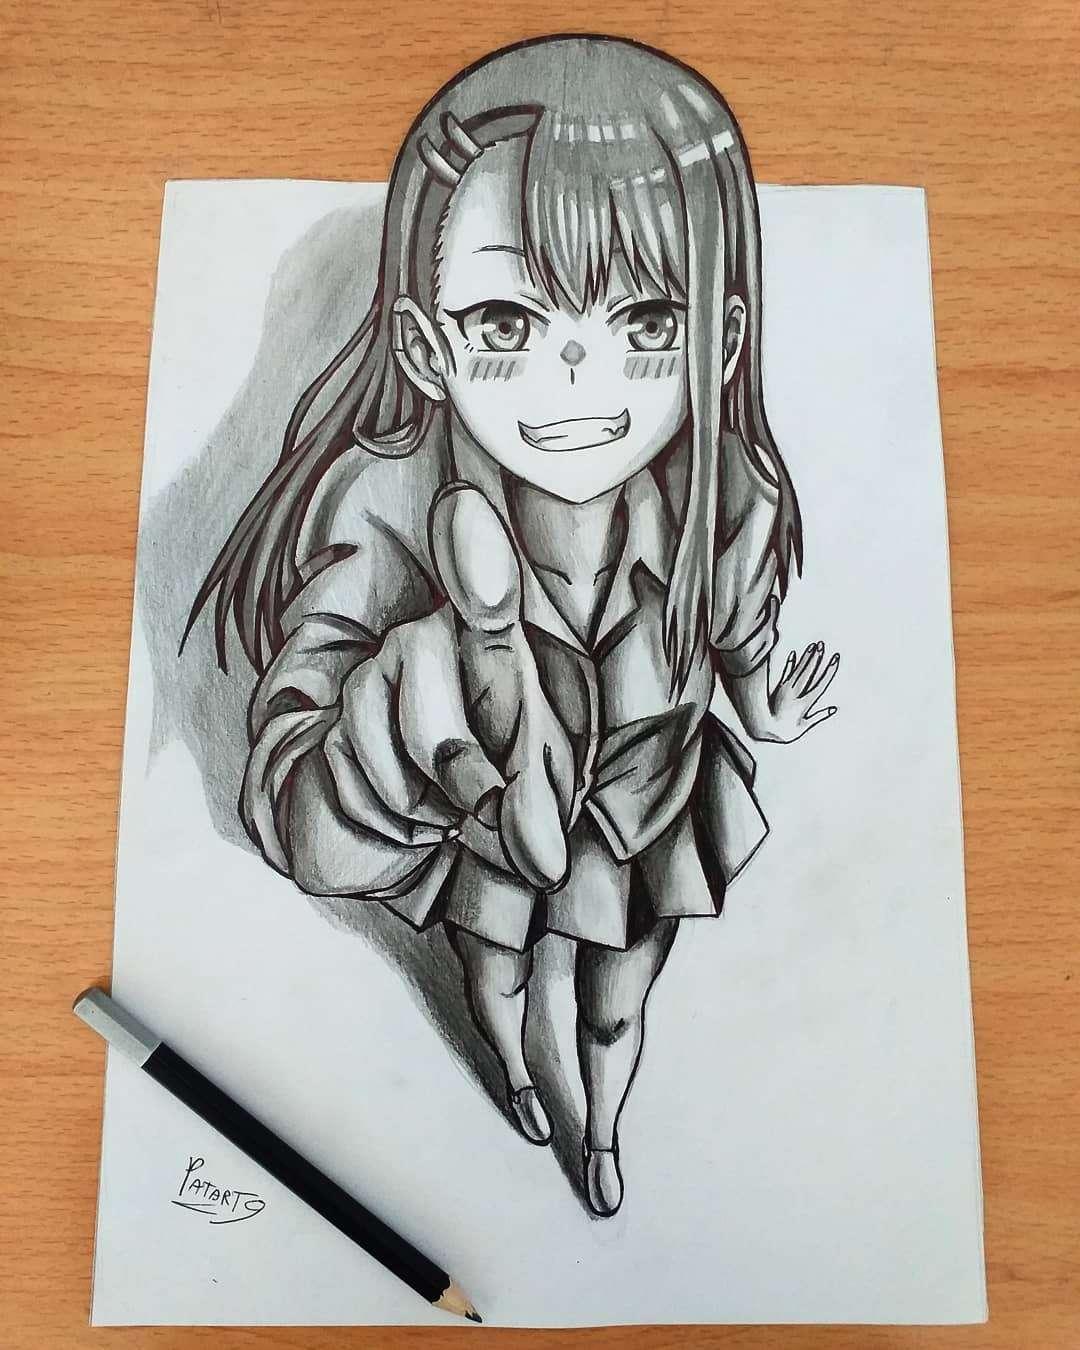 Nagatoro (Nagatoro-san) by patart9 Anime Art of the Week